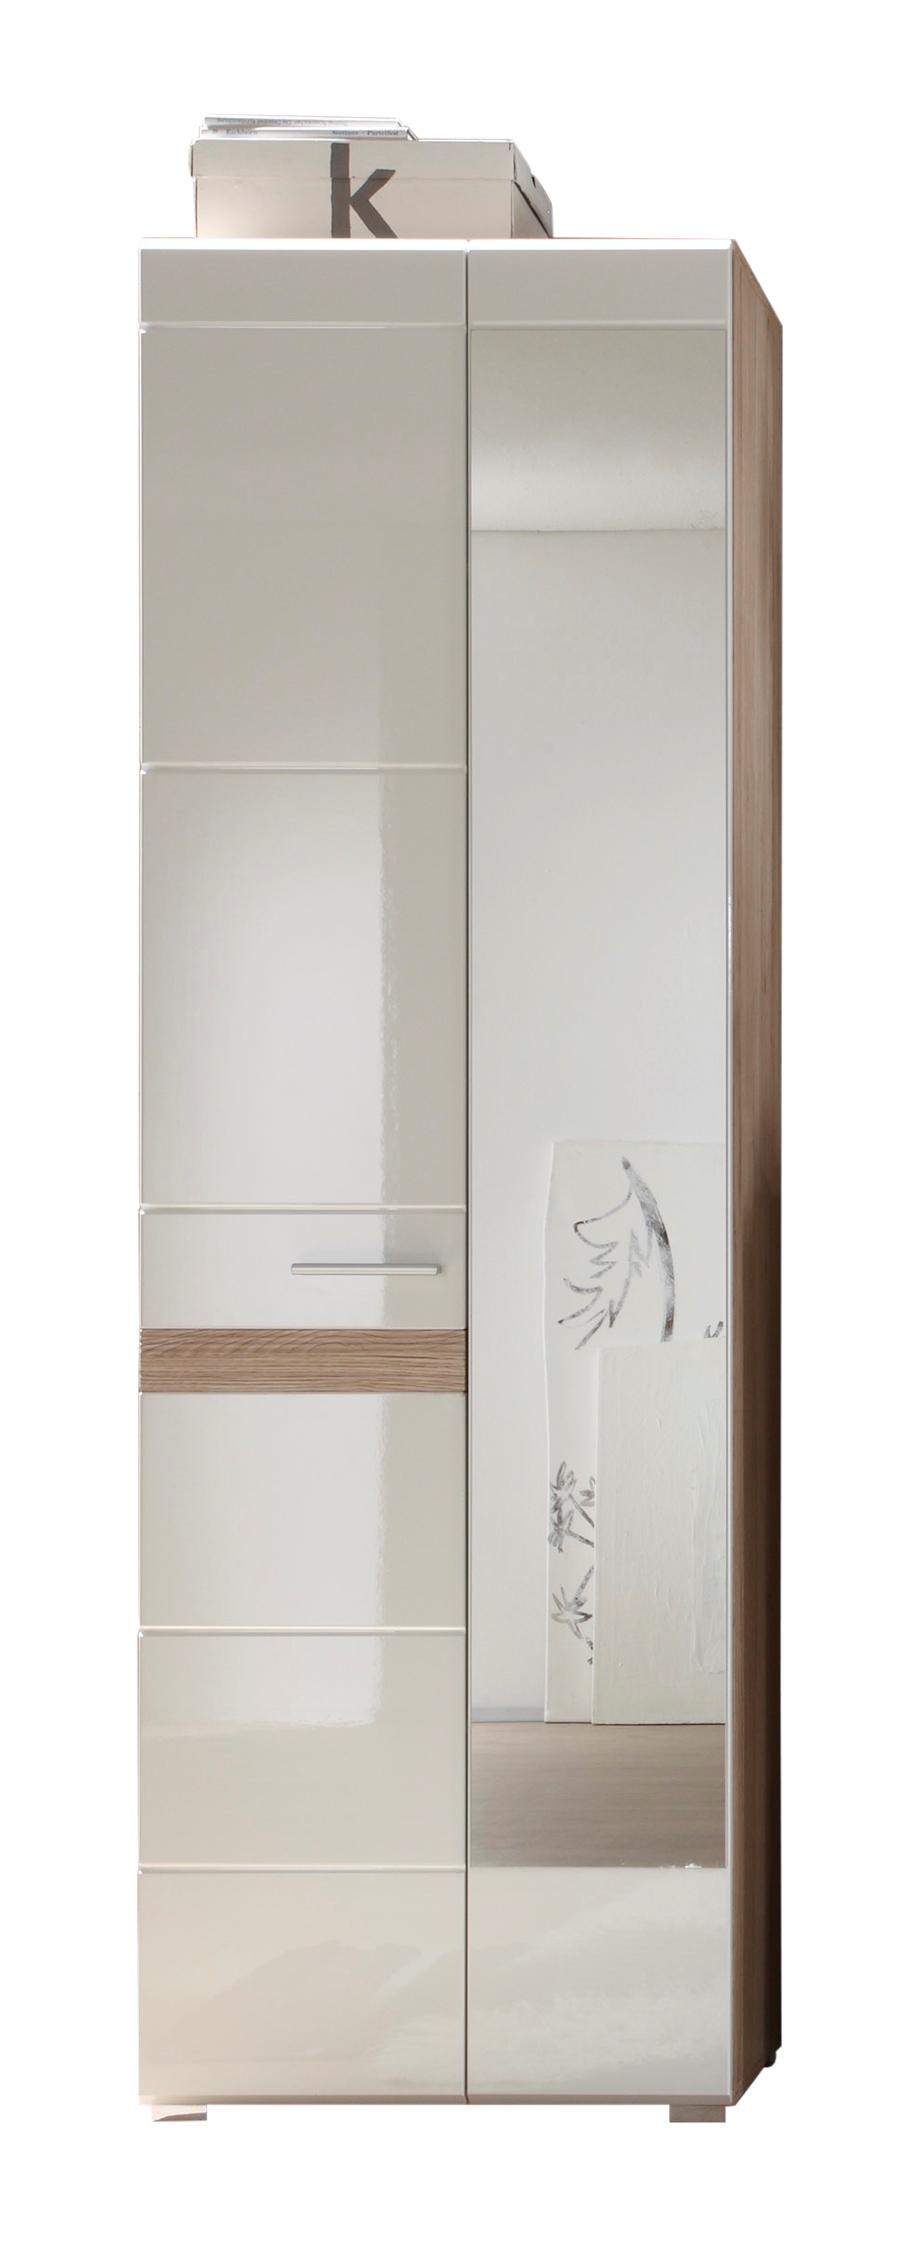 Garderobenschrank Alexia 2-türig Weiß